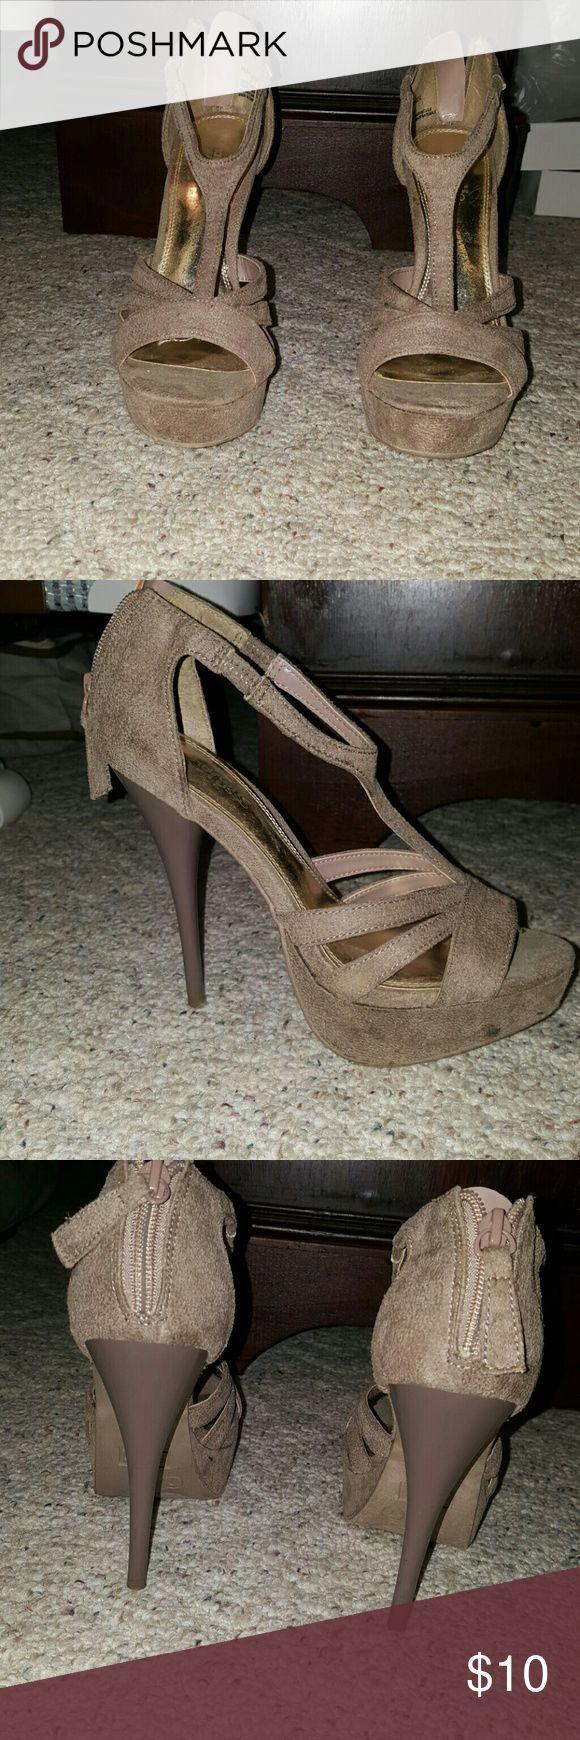 "Charlotte Russe beige strappy heels Beige strappy heels. Small zipper at heel. 5"" heel. 1"" platform. Charlotte Russe Shoes Heels"